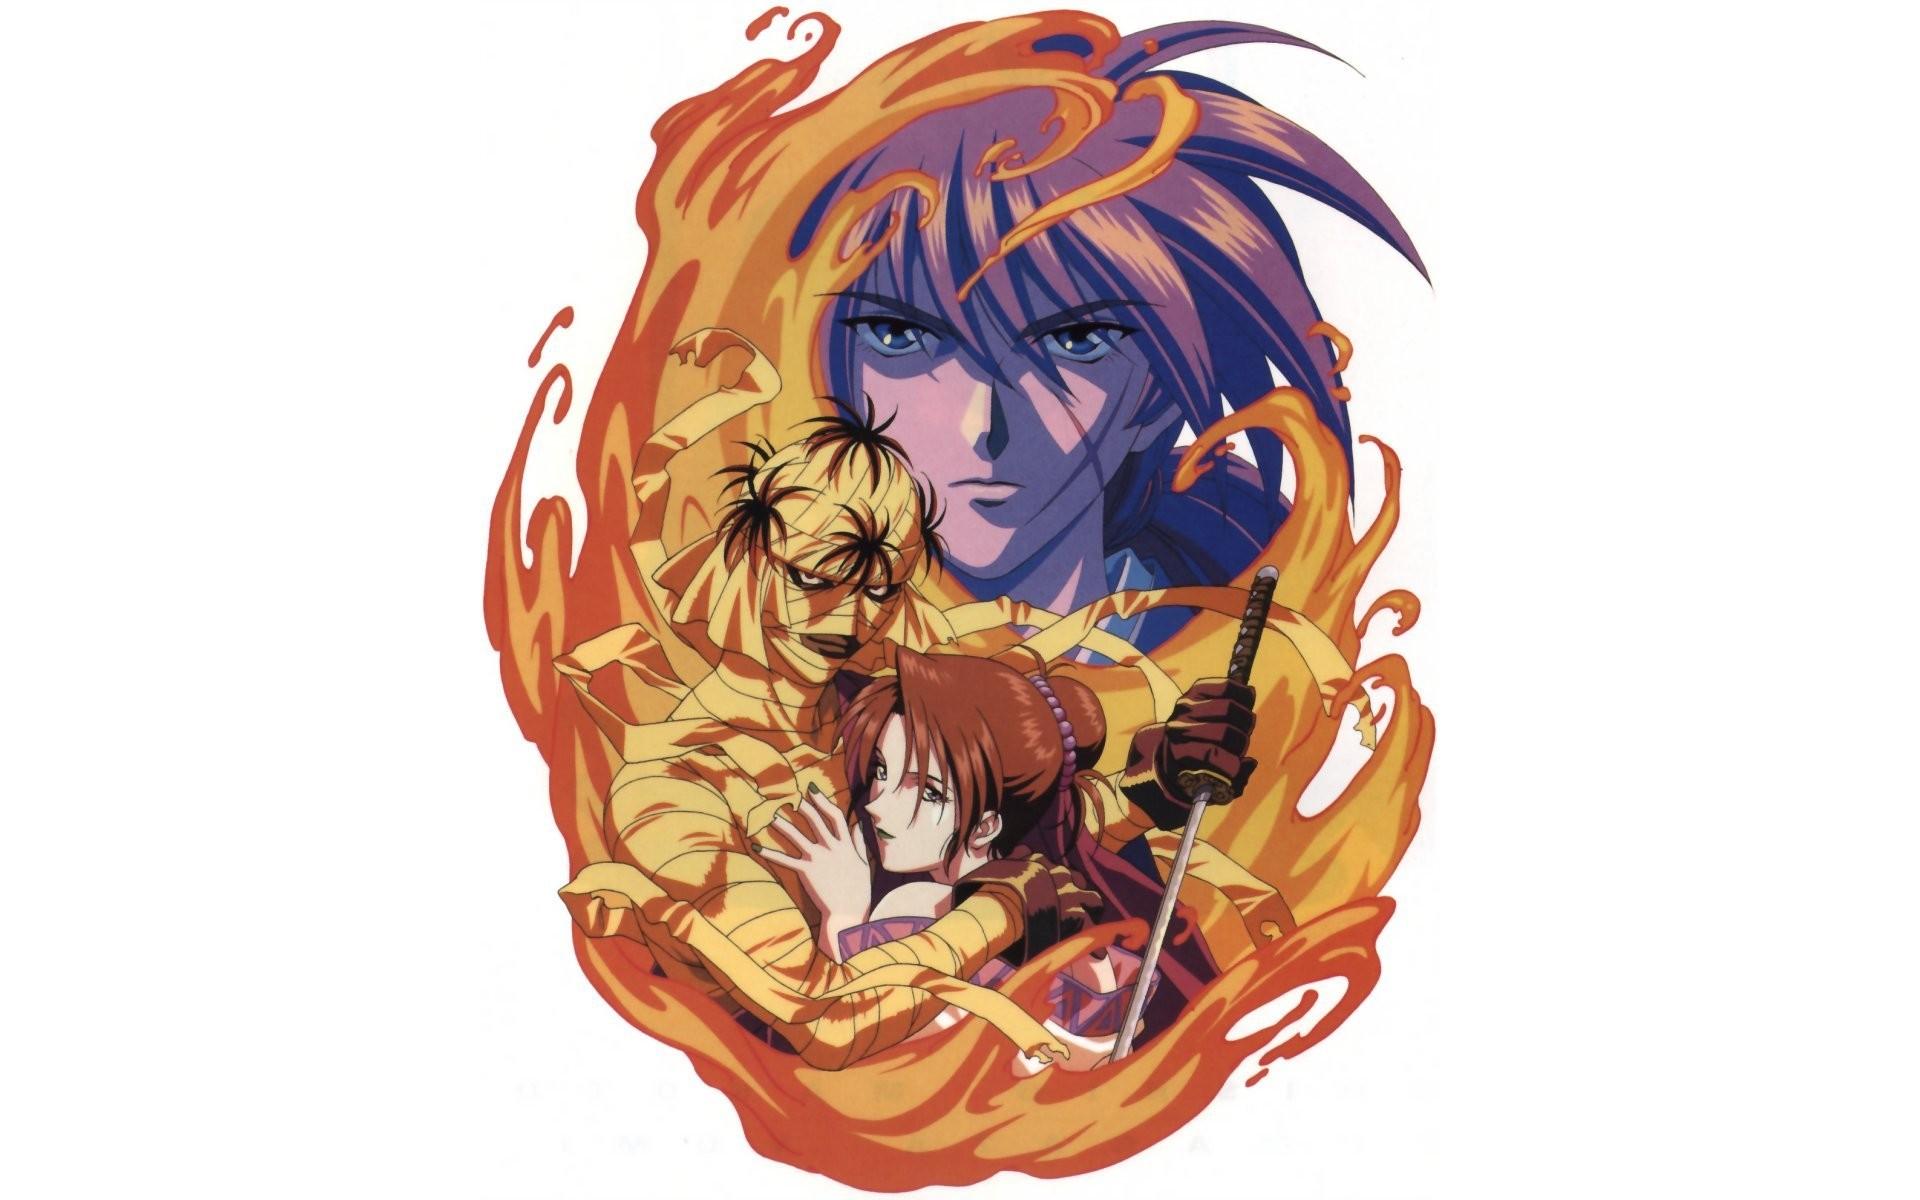 Rurouni Kenshin Kenshin anime wallpaper | | 298982 | WallpaperUP